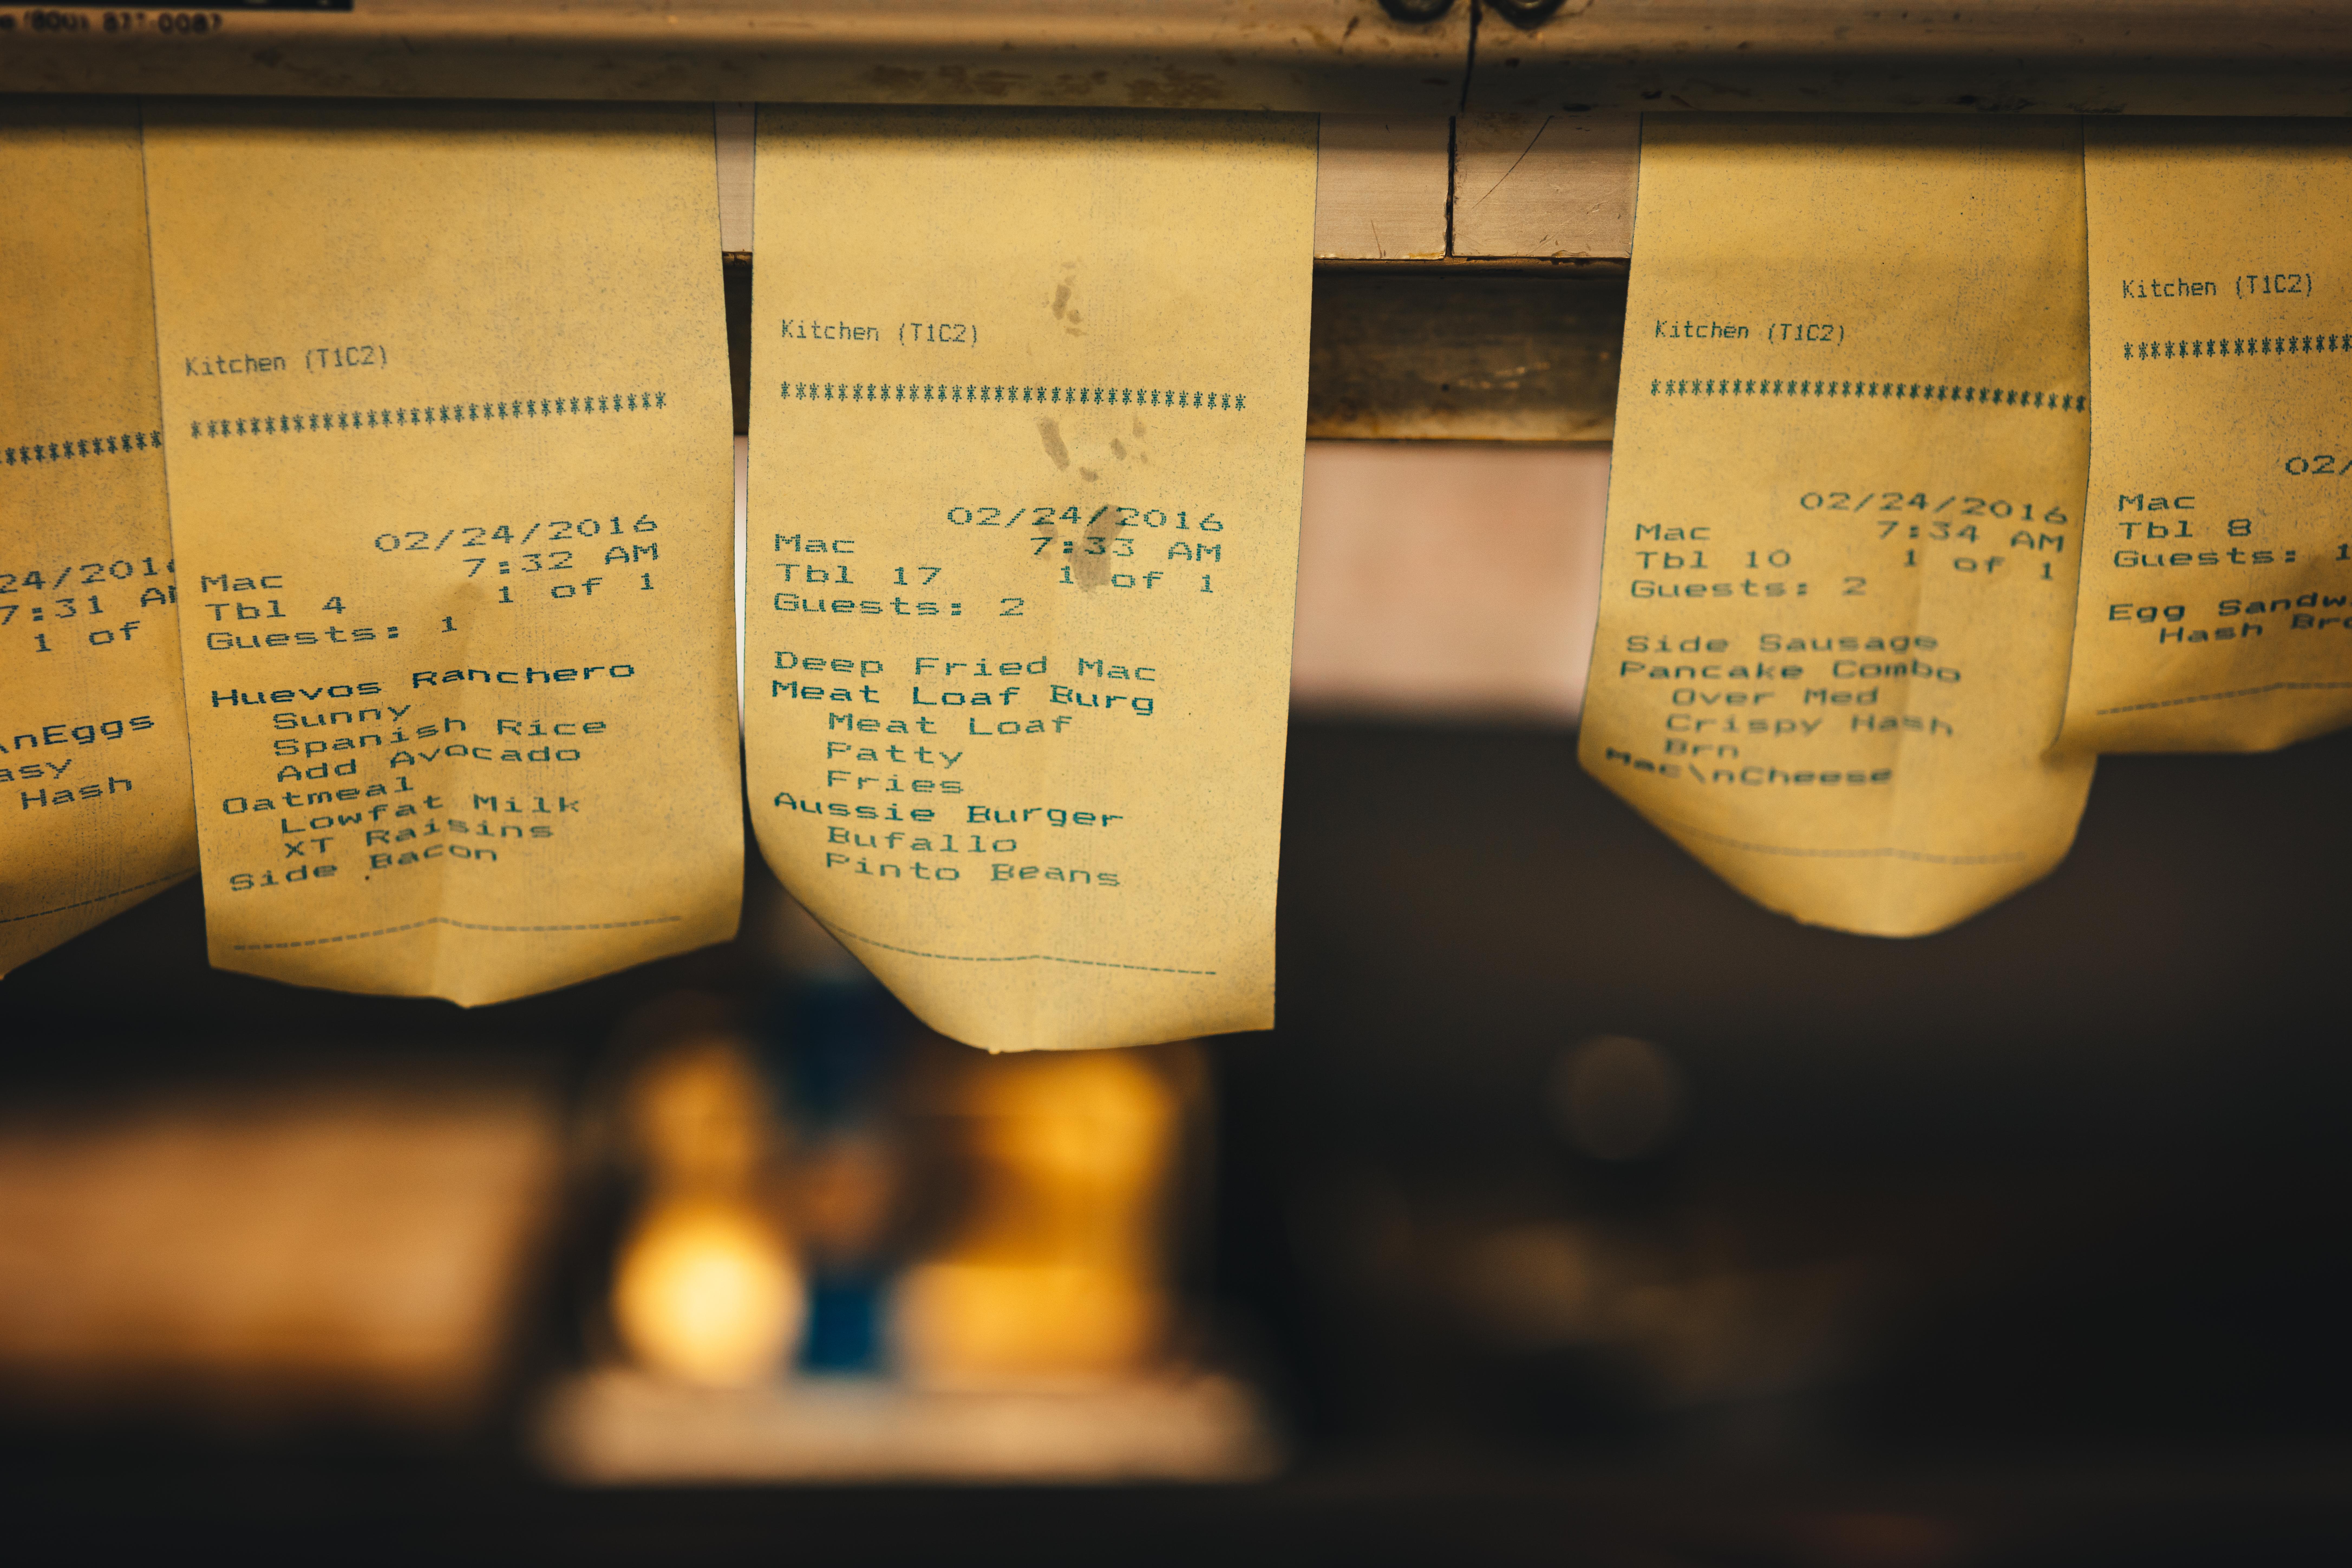 restaurant receipts orders